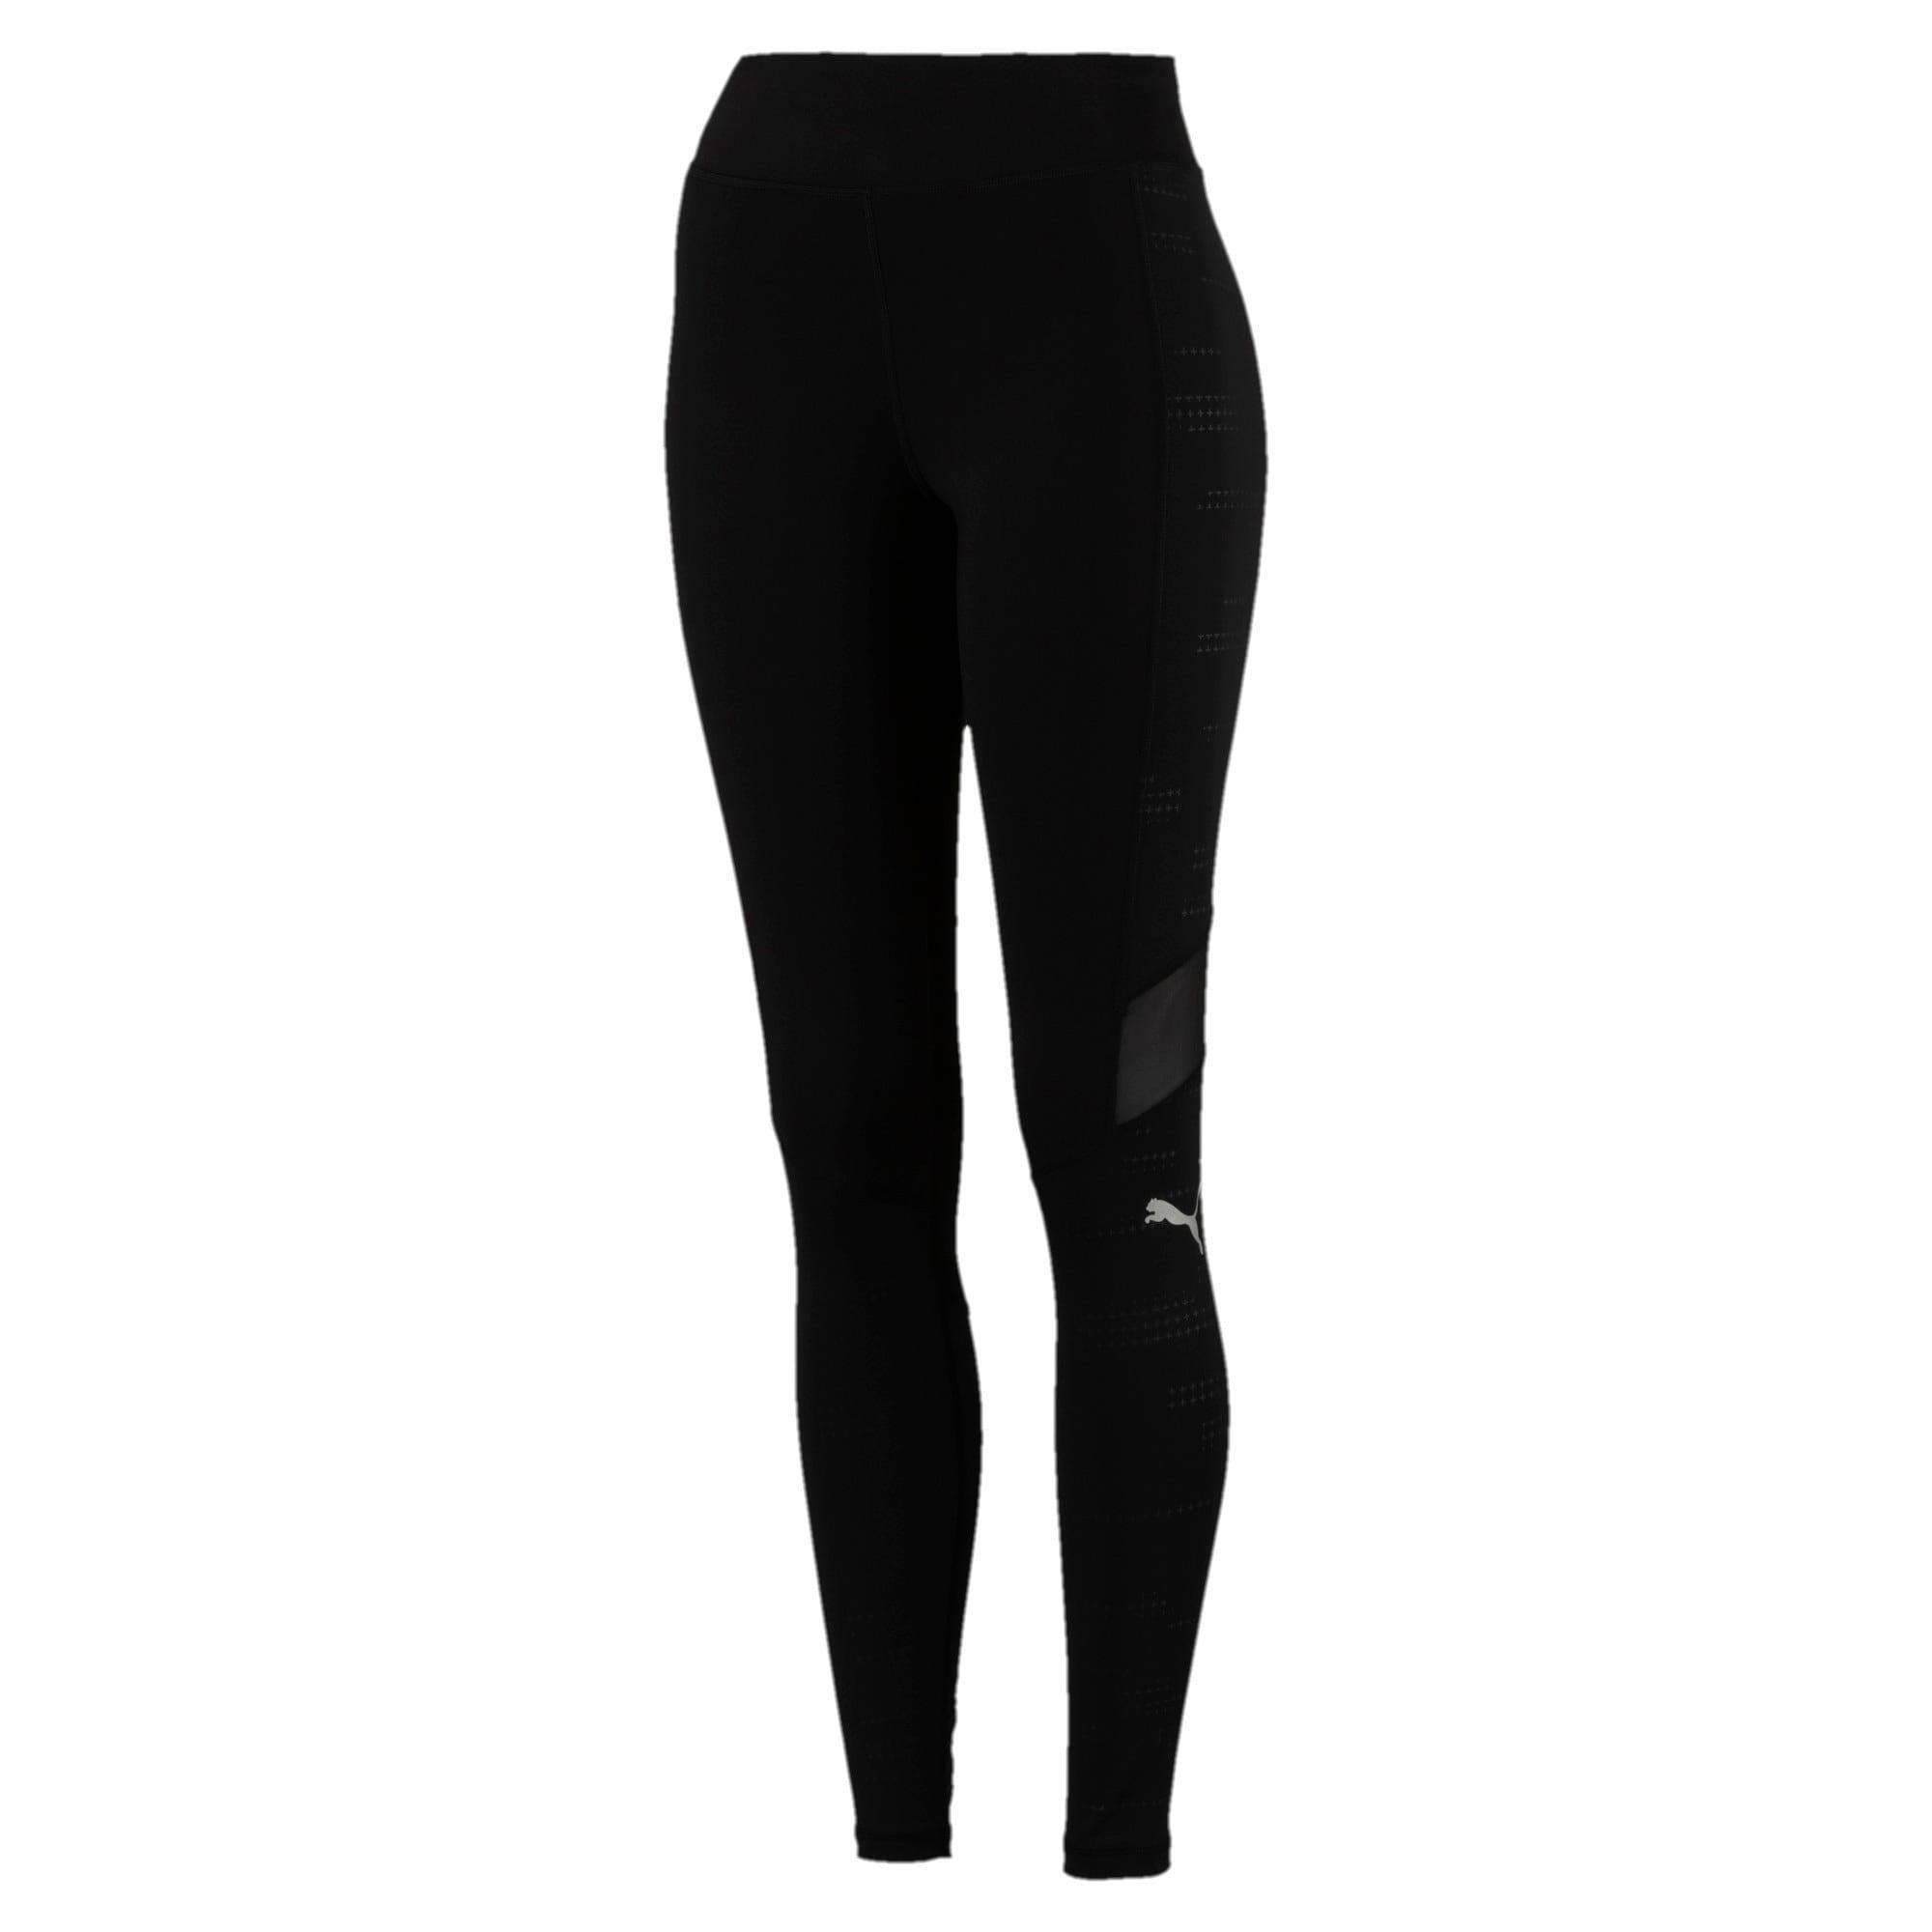 Thumbnail 4 of Ignite Women's Running Leggings, Puma Black, medium-IND